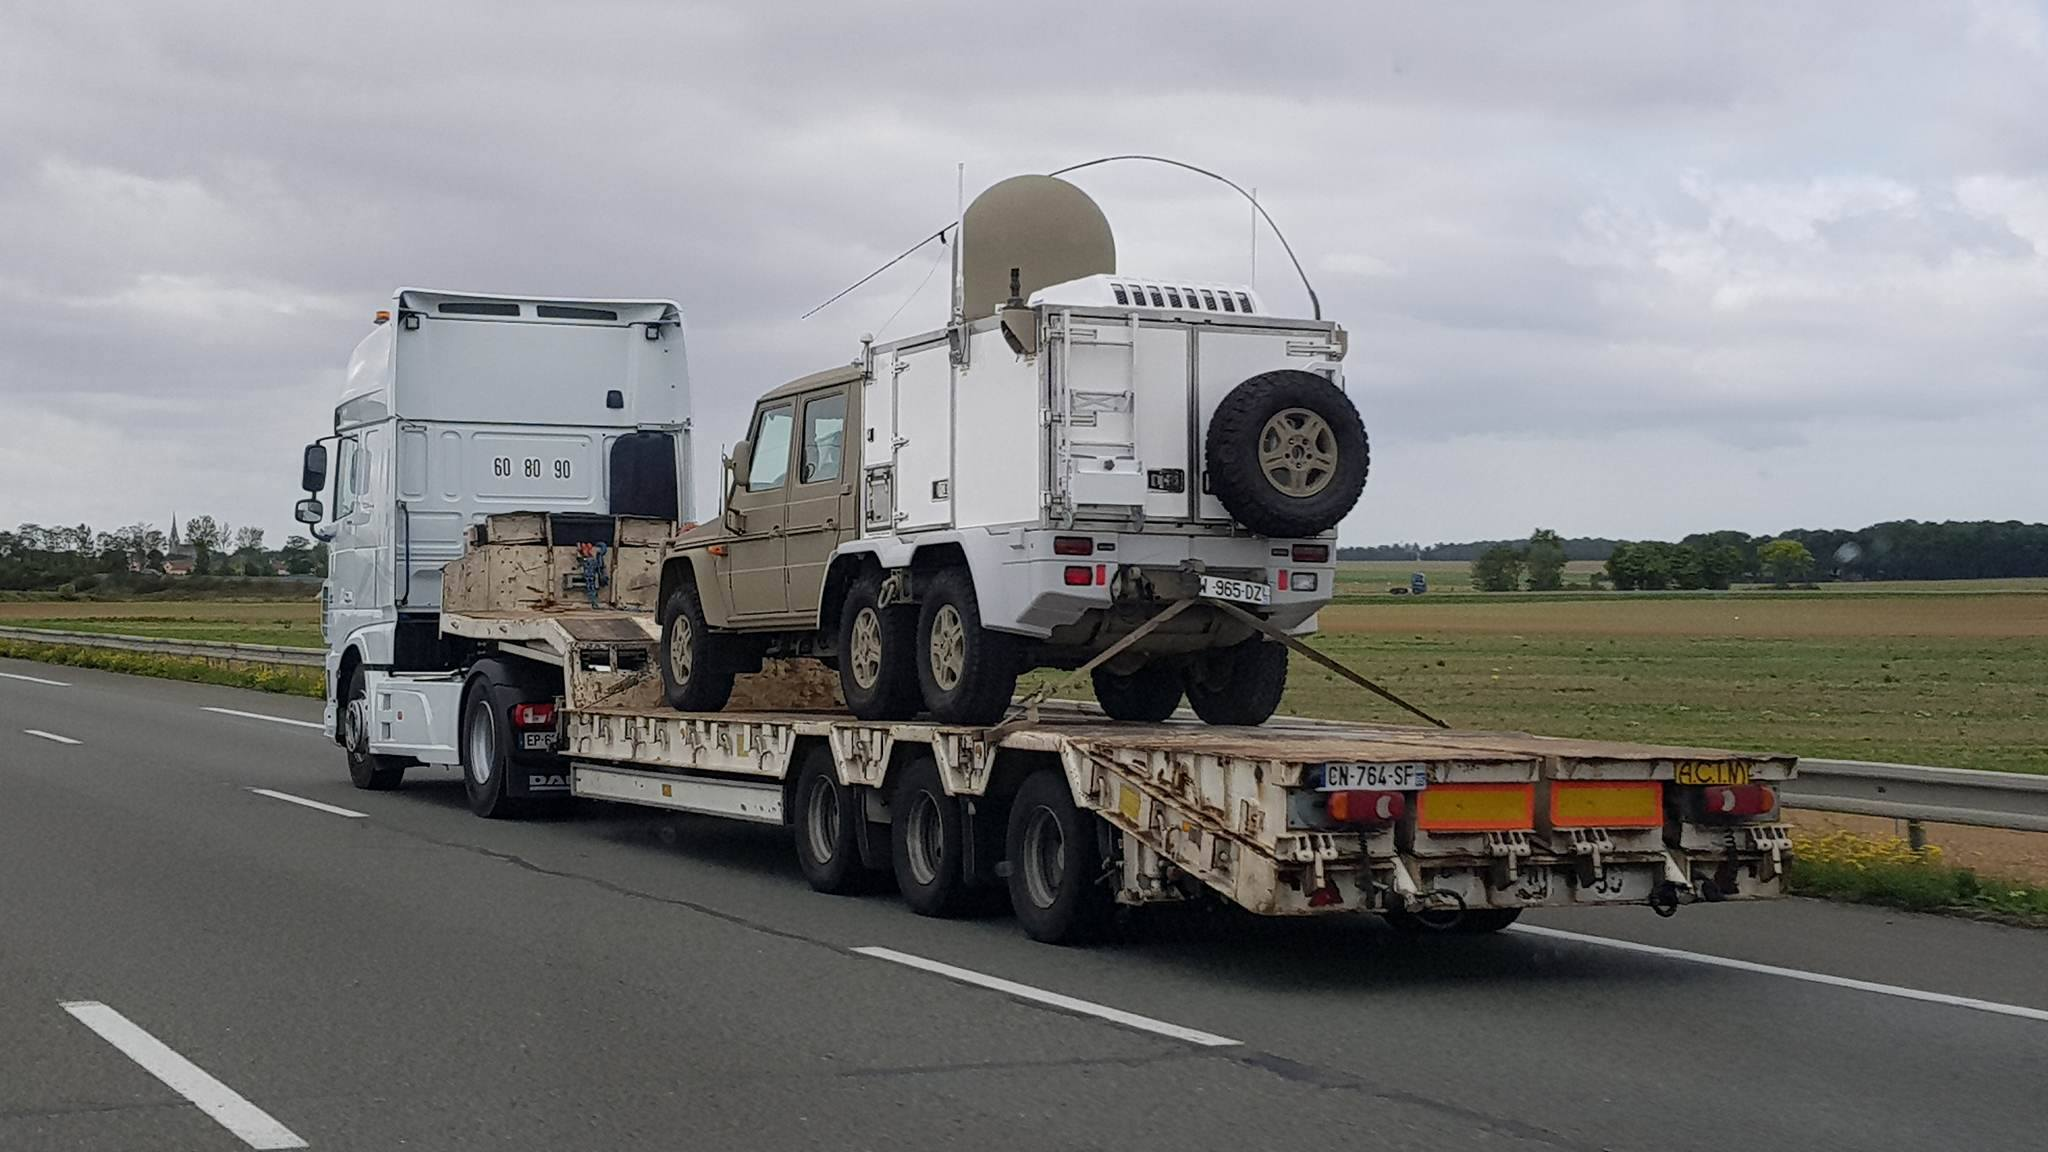 Mercedes G Class 6x6 Military France 2017 Sixmania